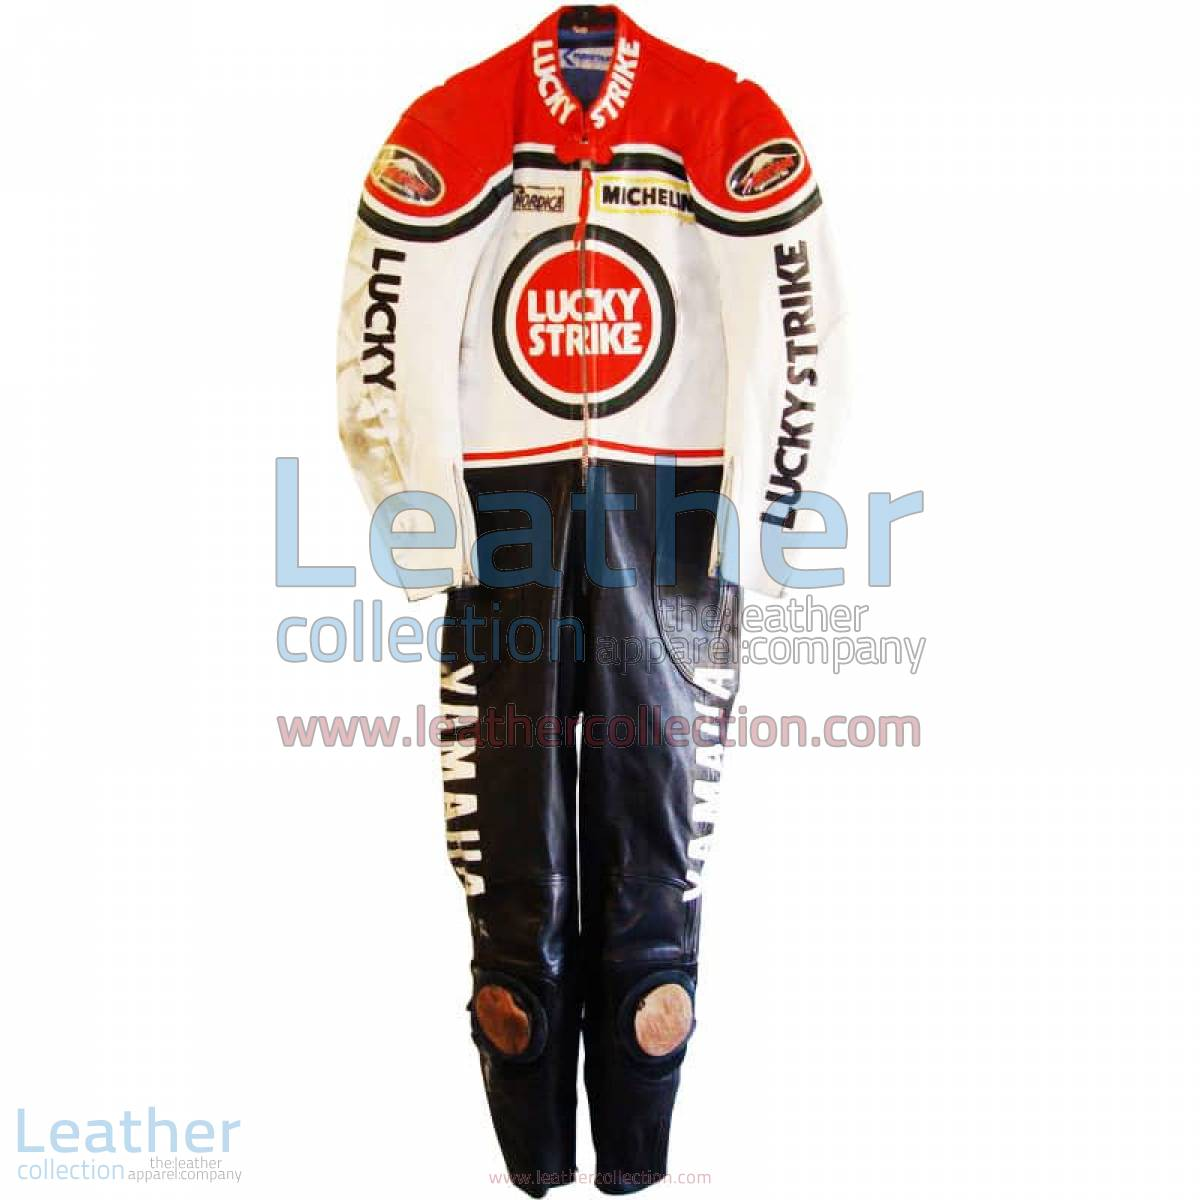 Randy Mamola Lucky Strike Yamaha GP 1986 Leathers | yamaha leathers